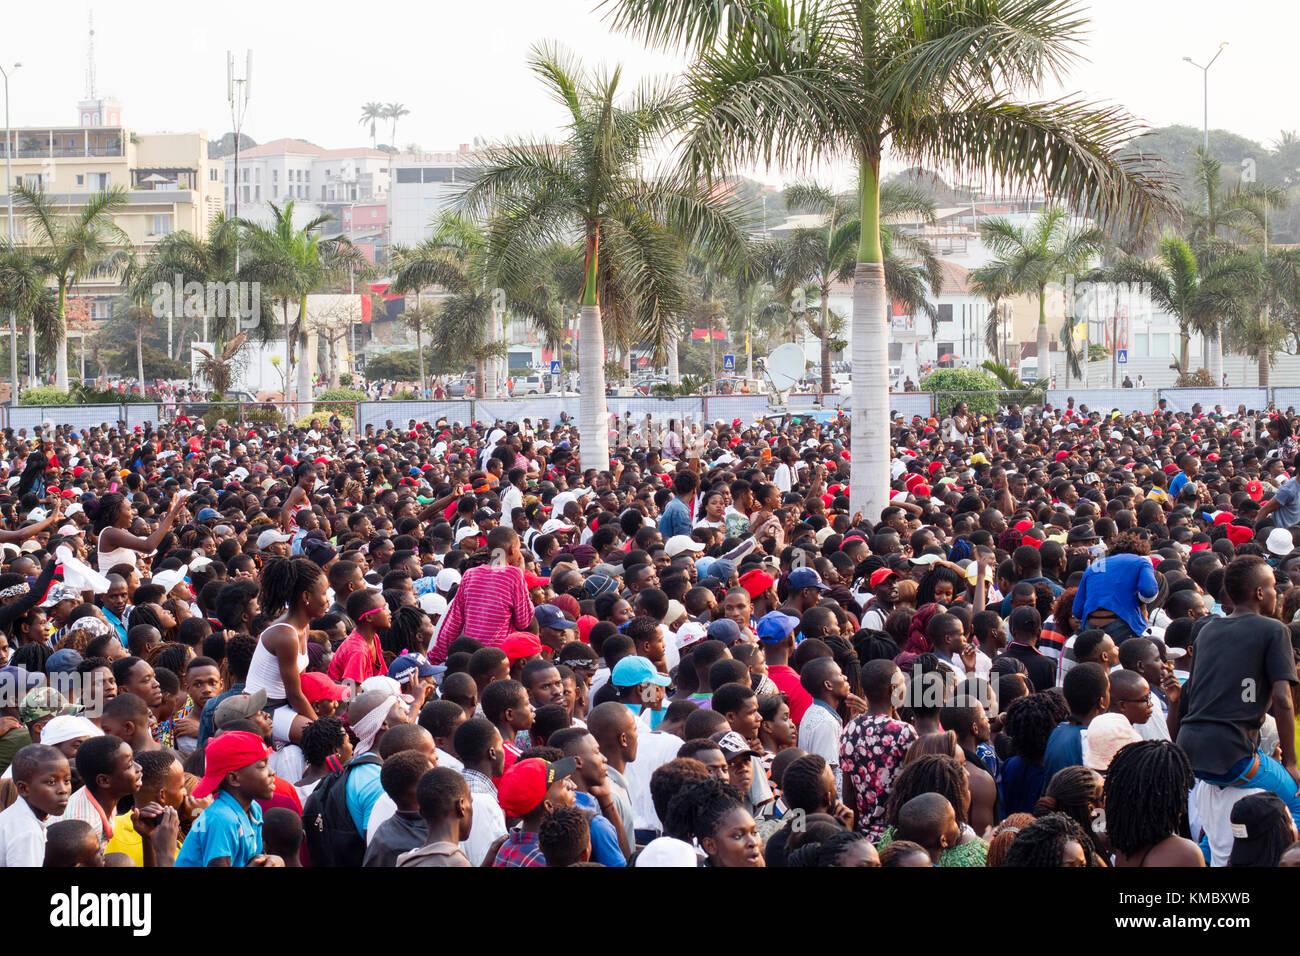 La etnia africana multitud esperando para mostrar en Luanda, Angola Imagen De Stock